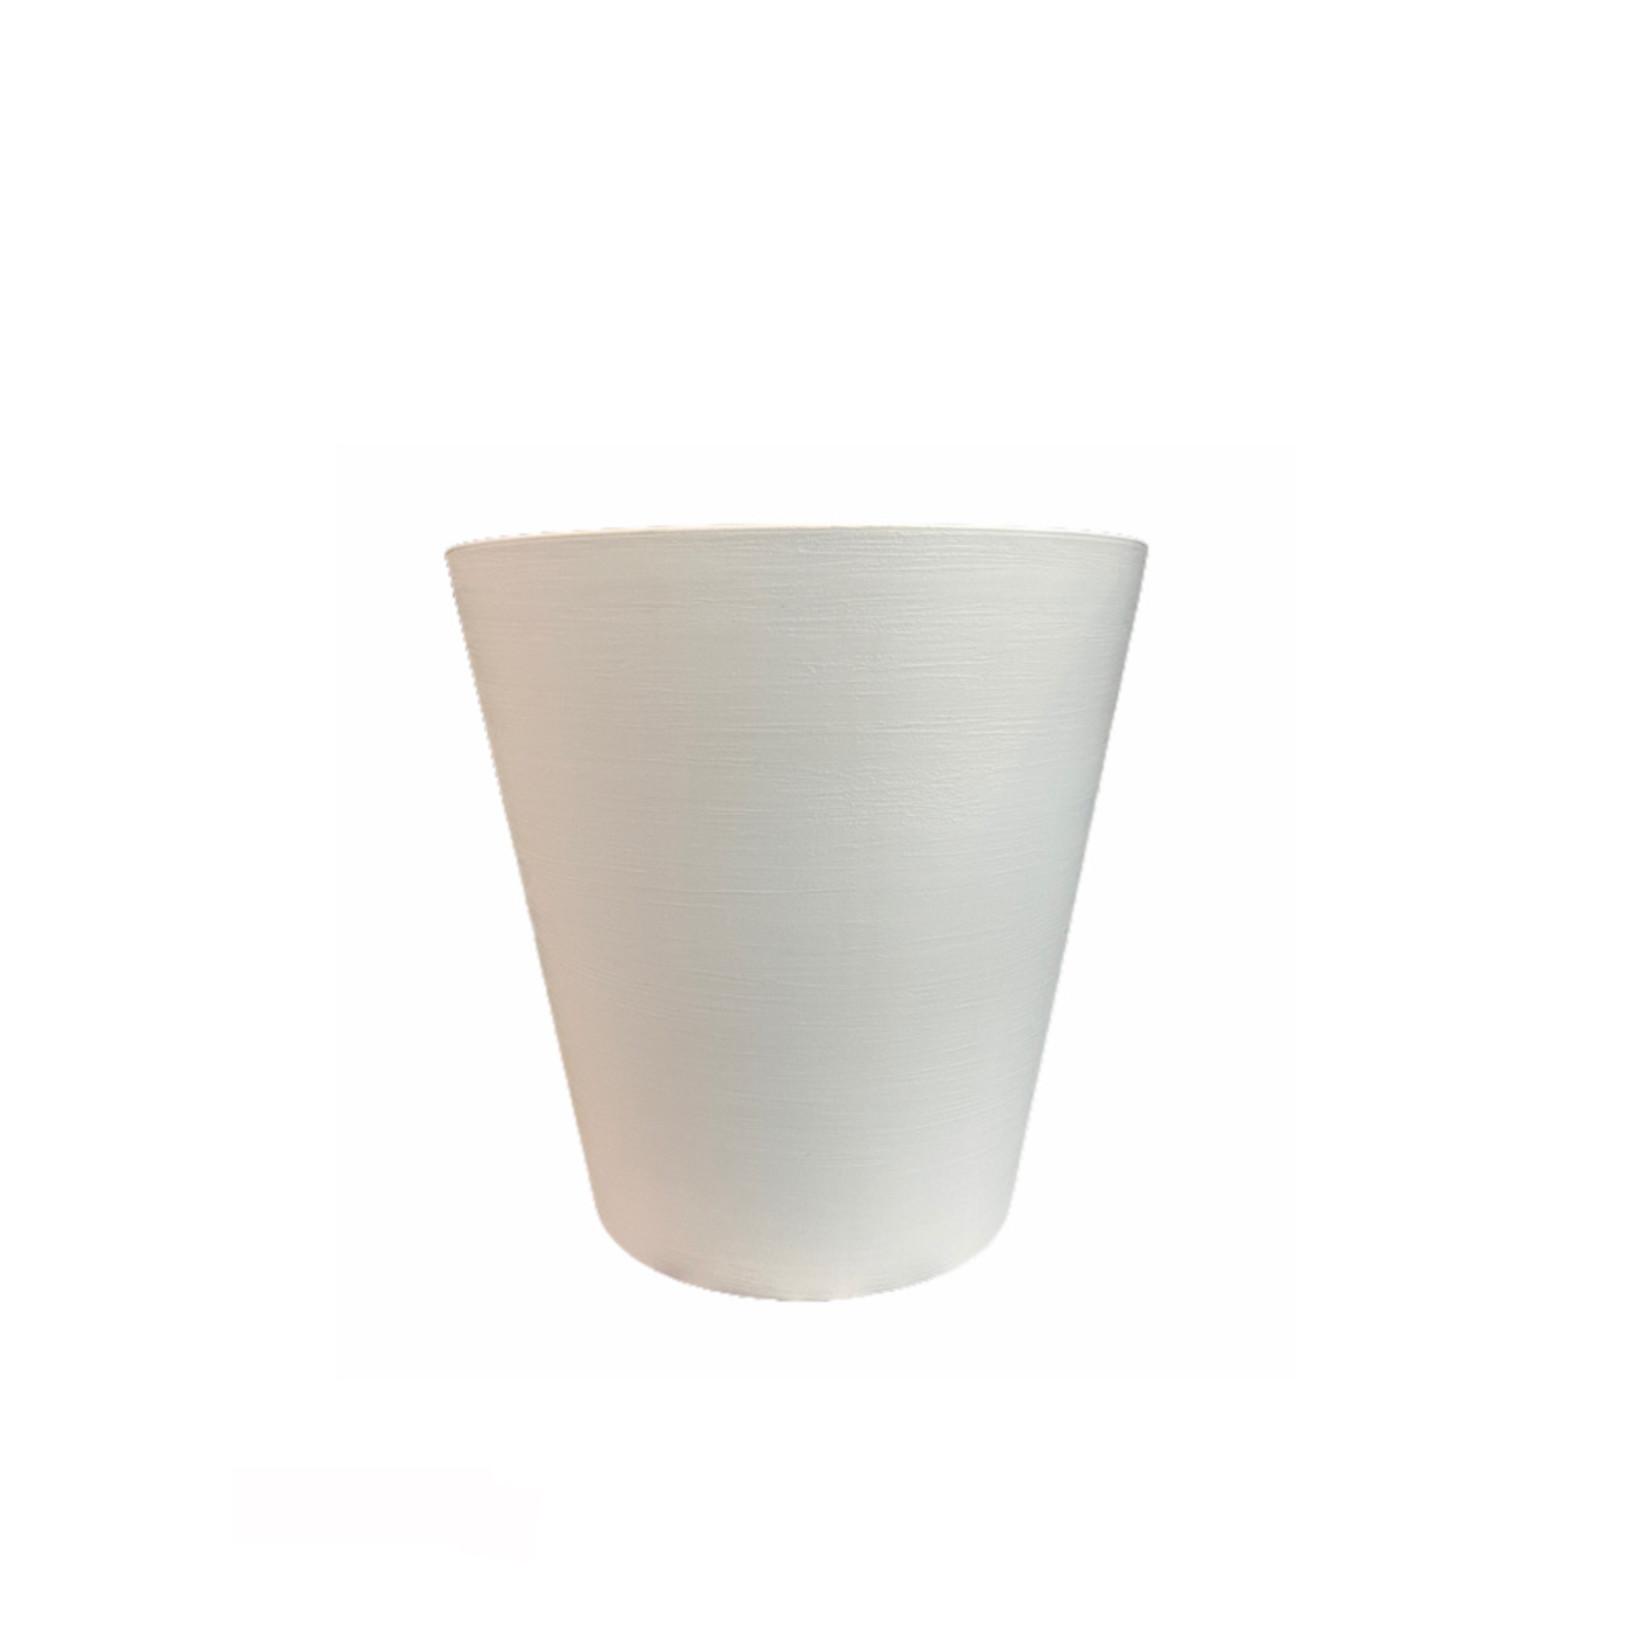 Teraplast Repot Hoop White 30cm